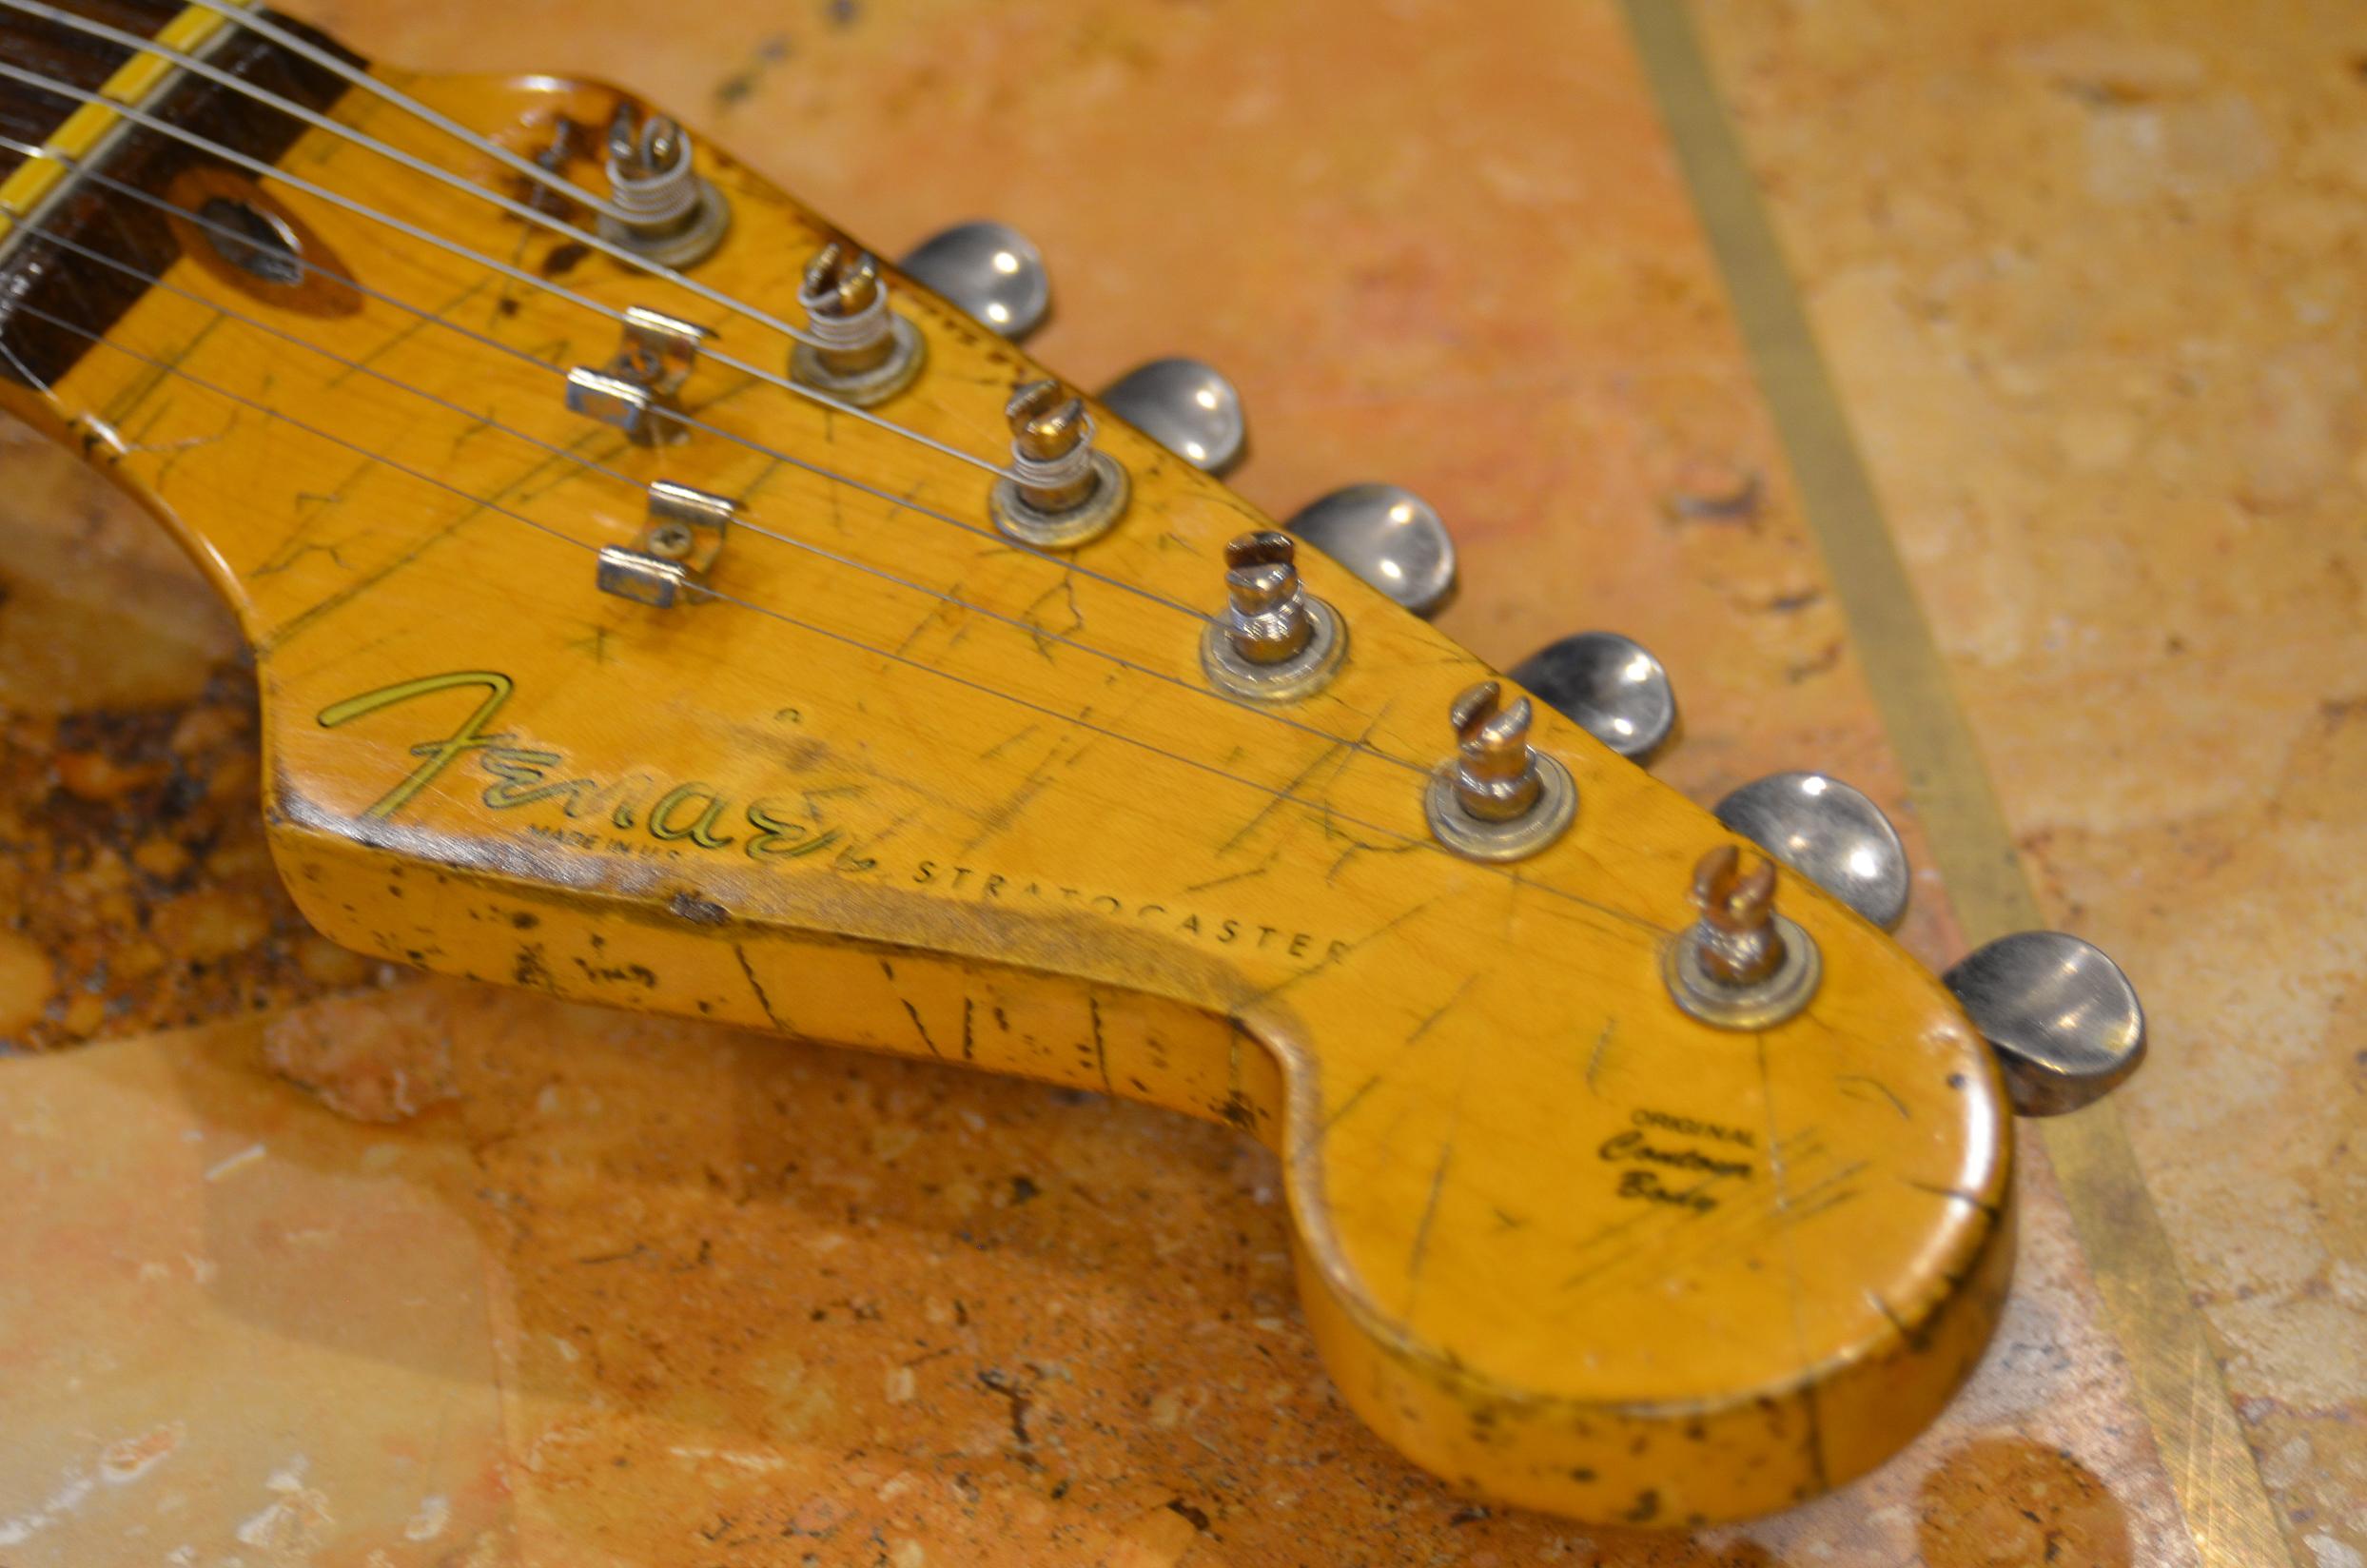 Fender Stratocaster Aged Headstock Logo Guitarwacky.com